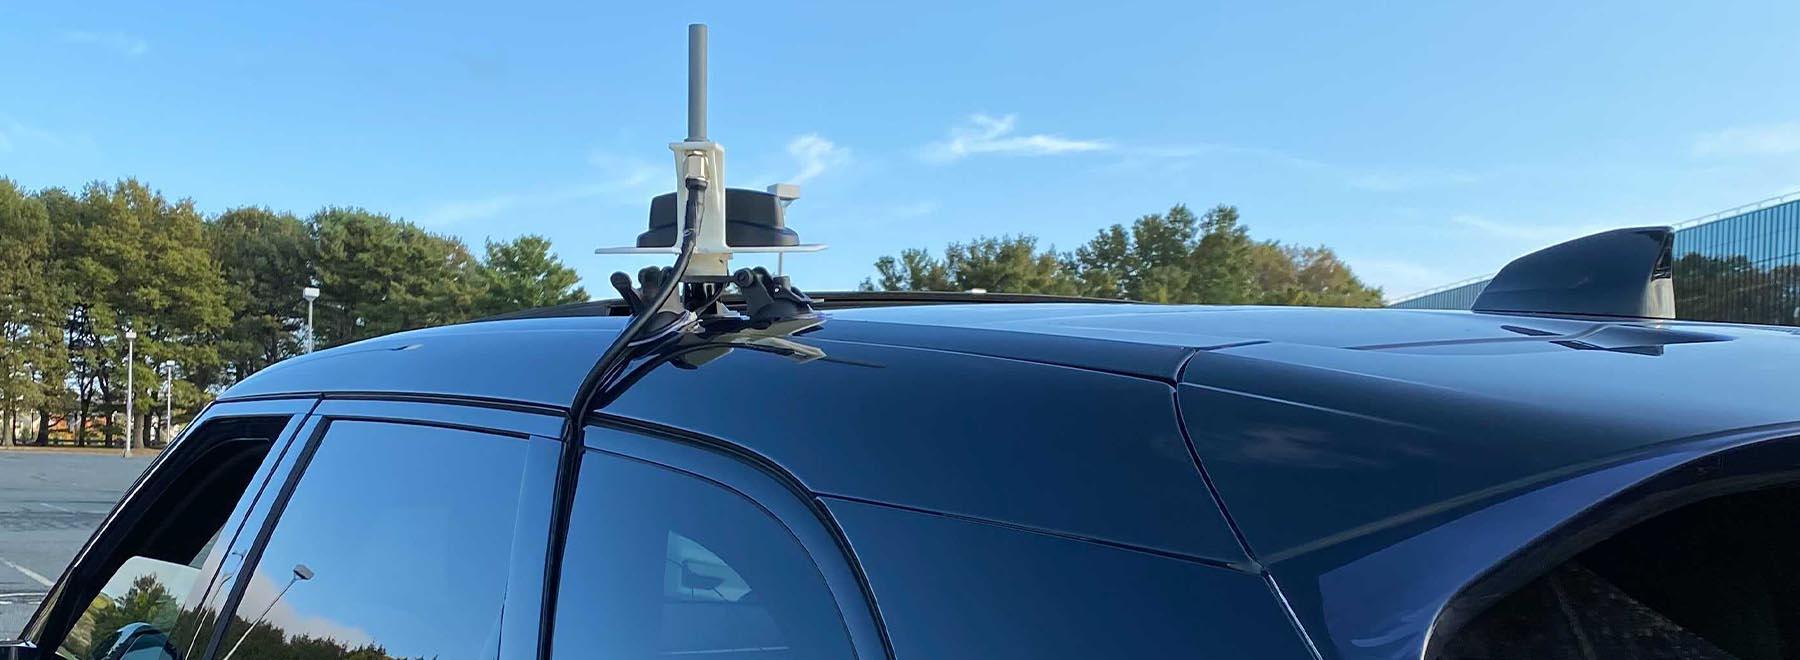 AirWarden Mobile Drone Detection - Antenna Mount